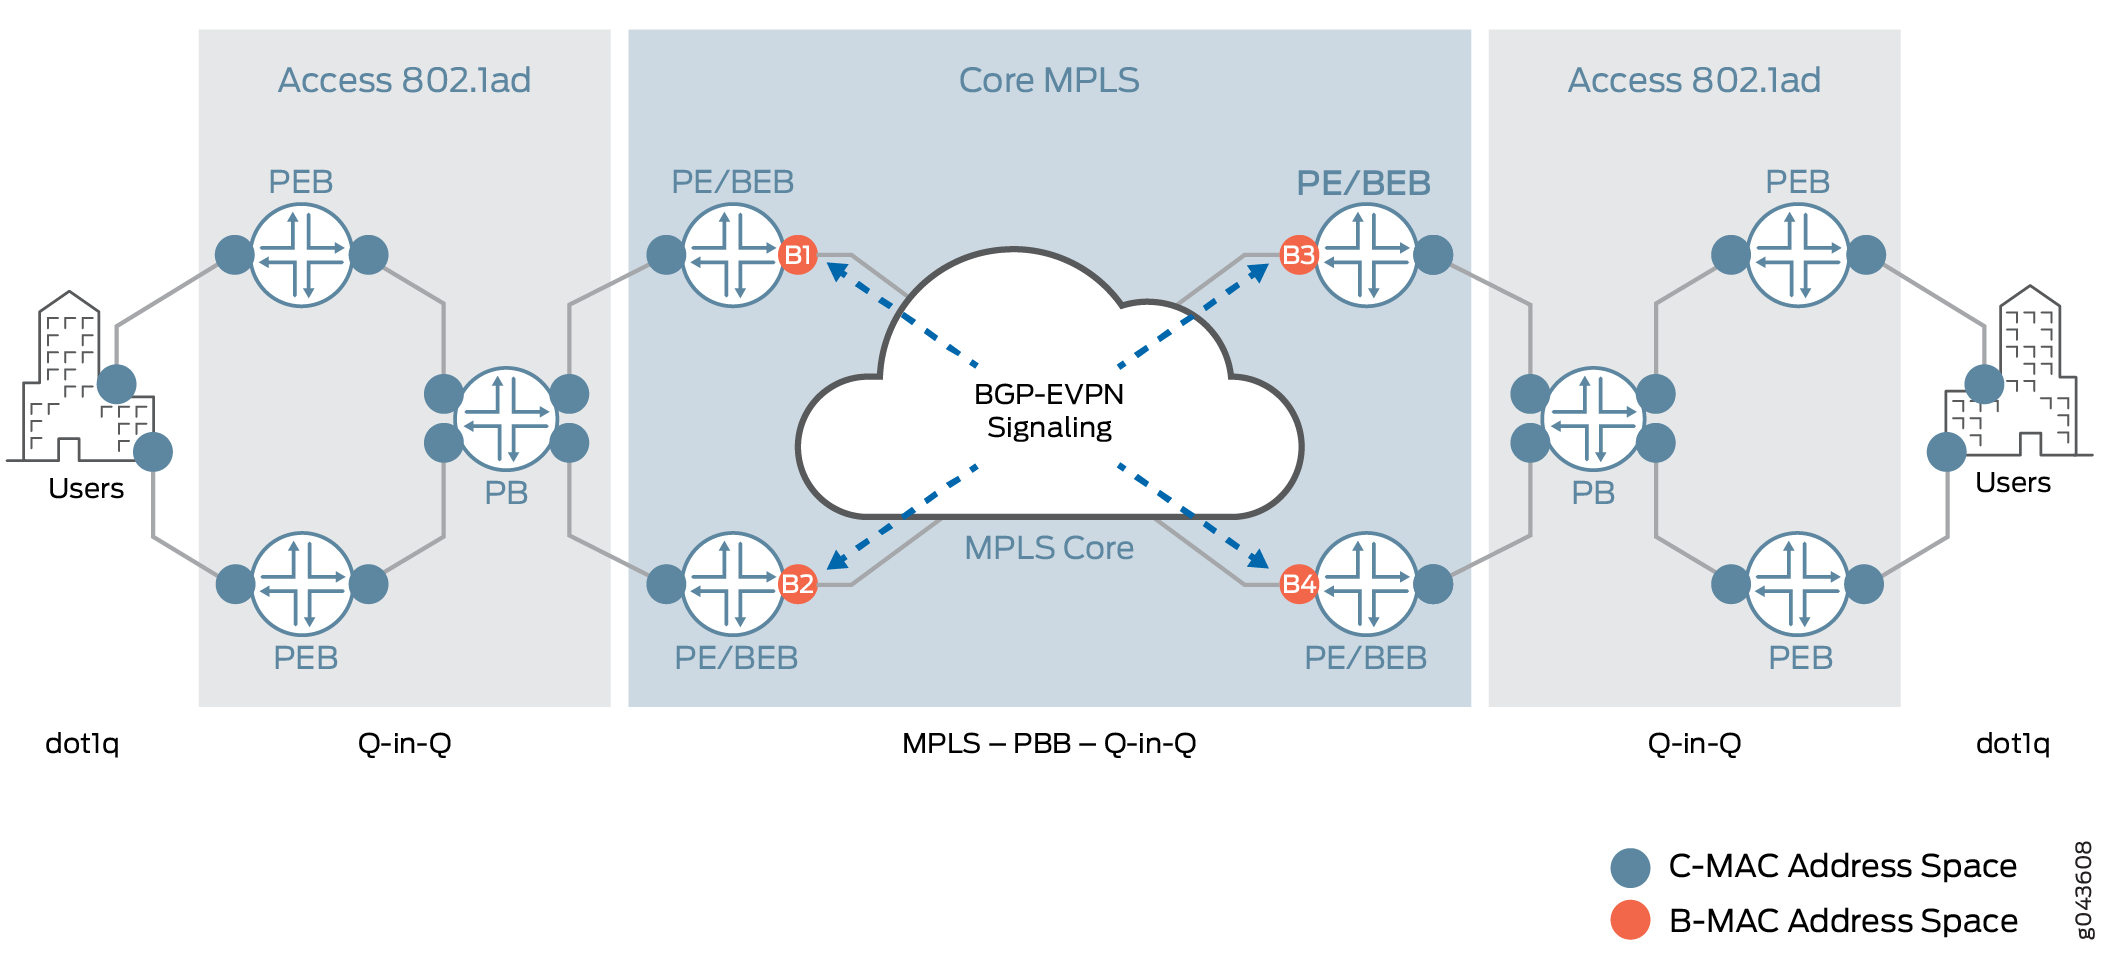 Provider Backbone Bridging (PBB) and EVPN Integration Overview